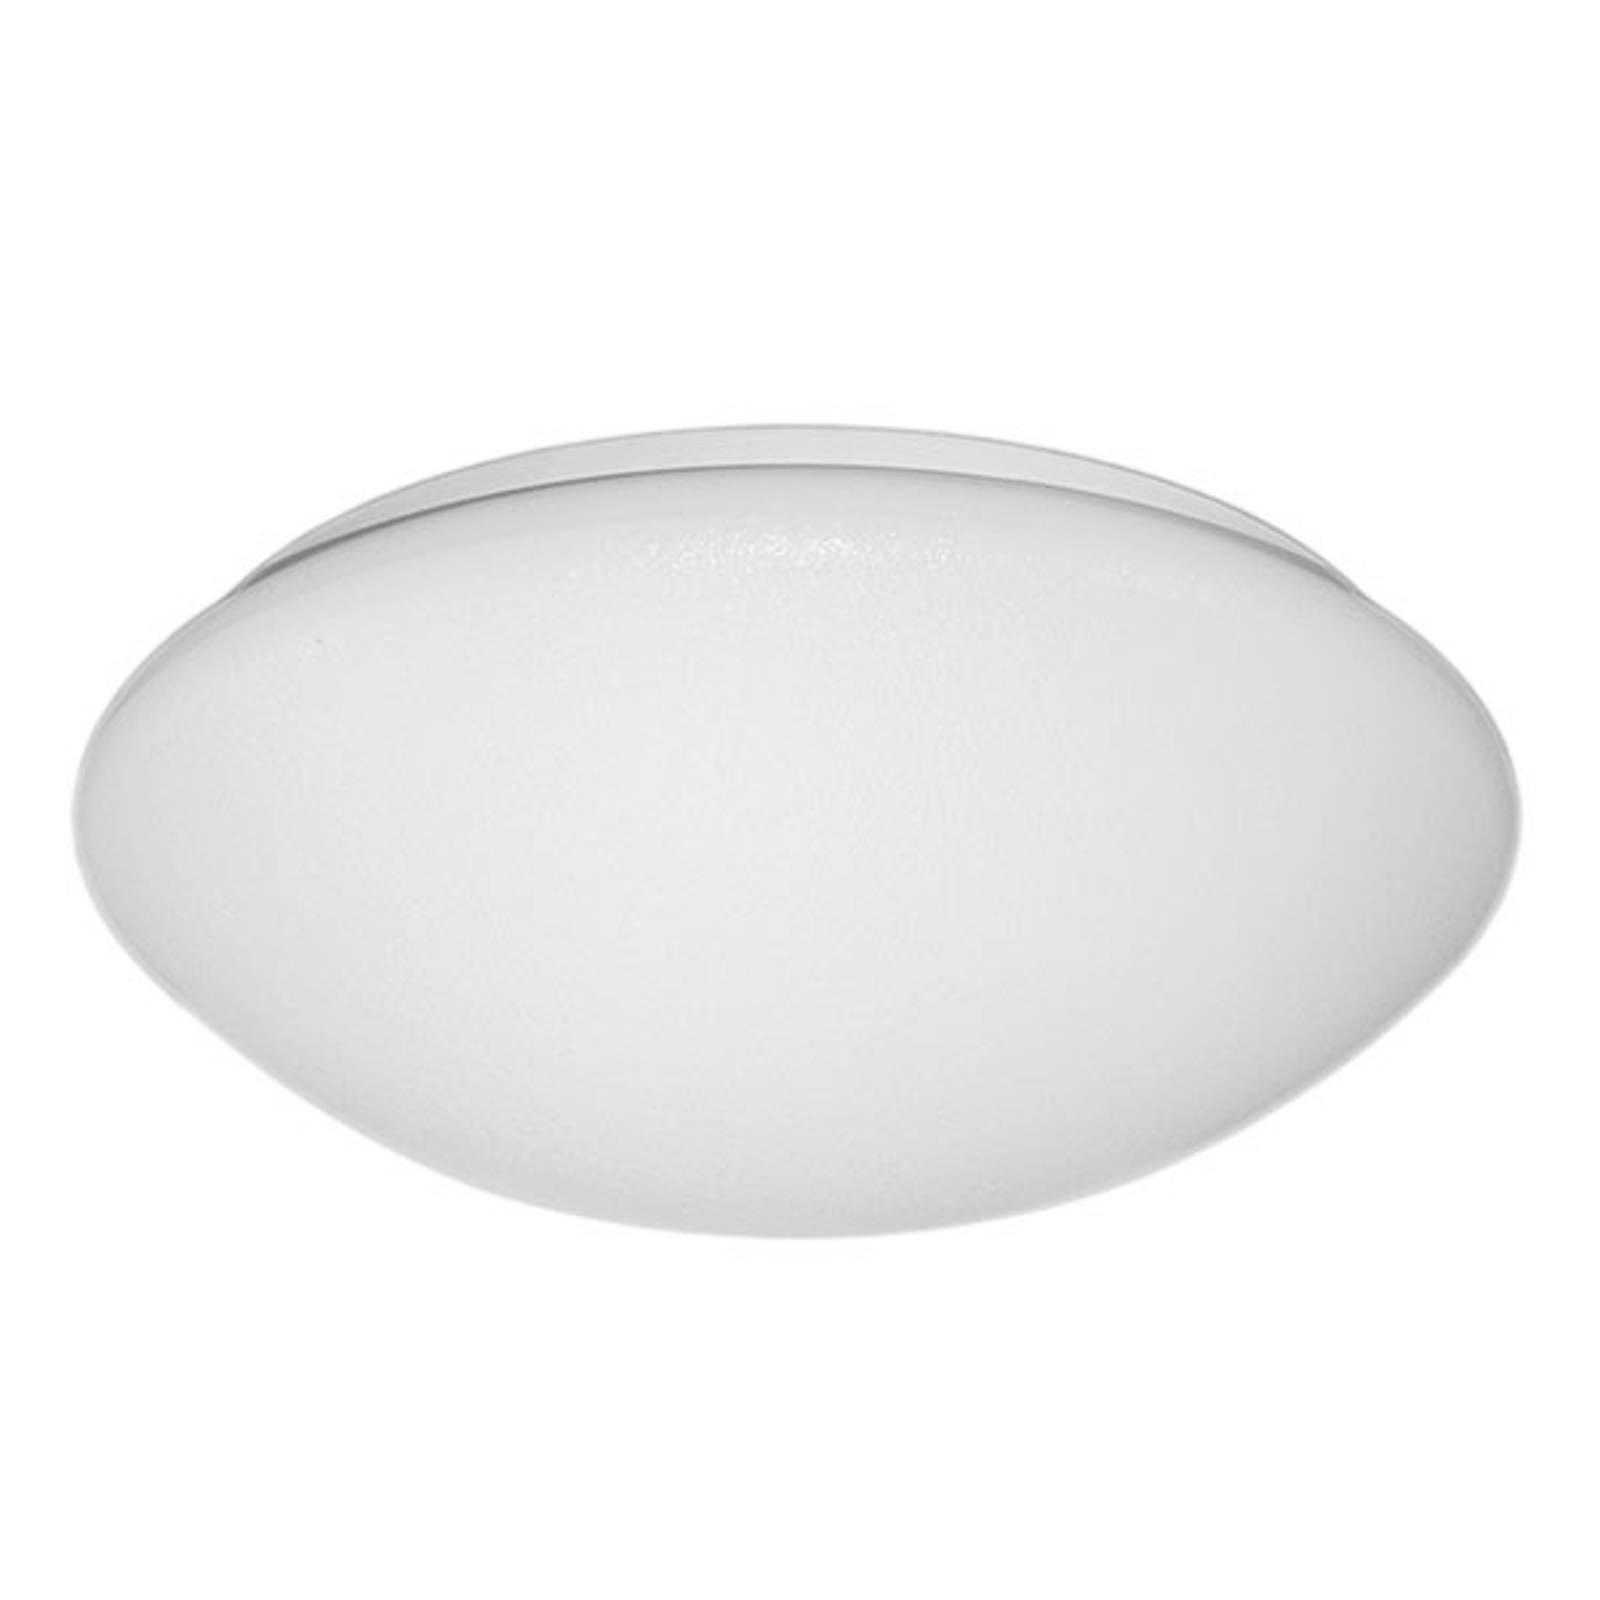 Grote LED plafondlamp, slagvast, 35 W, 4.000 K